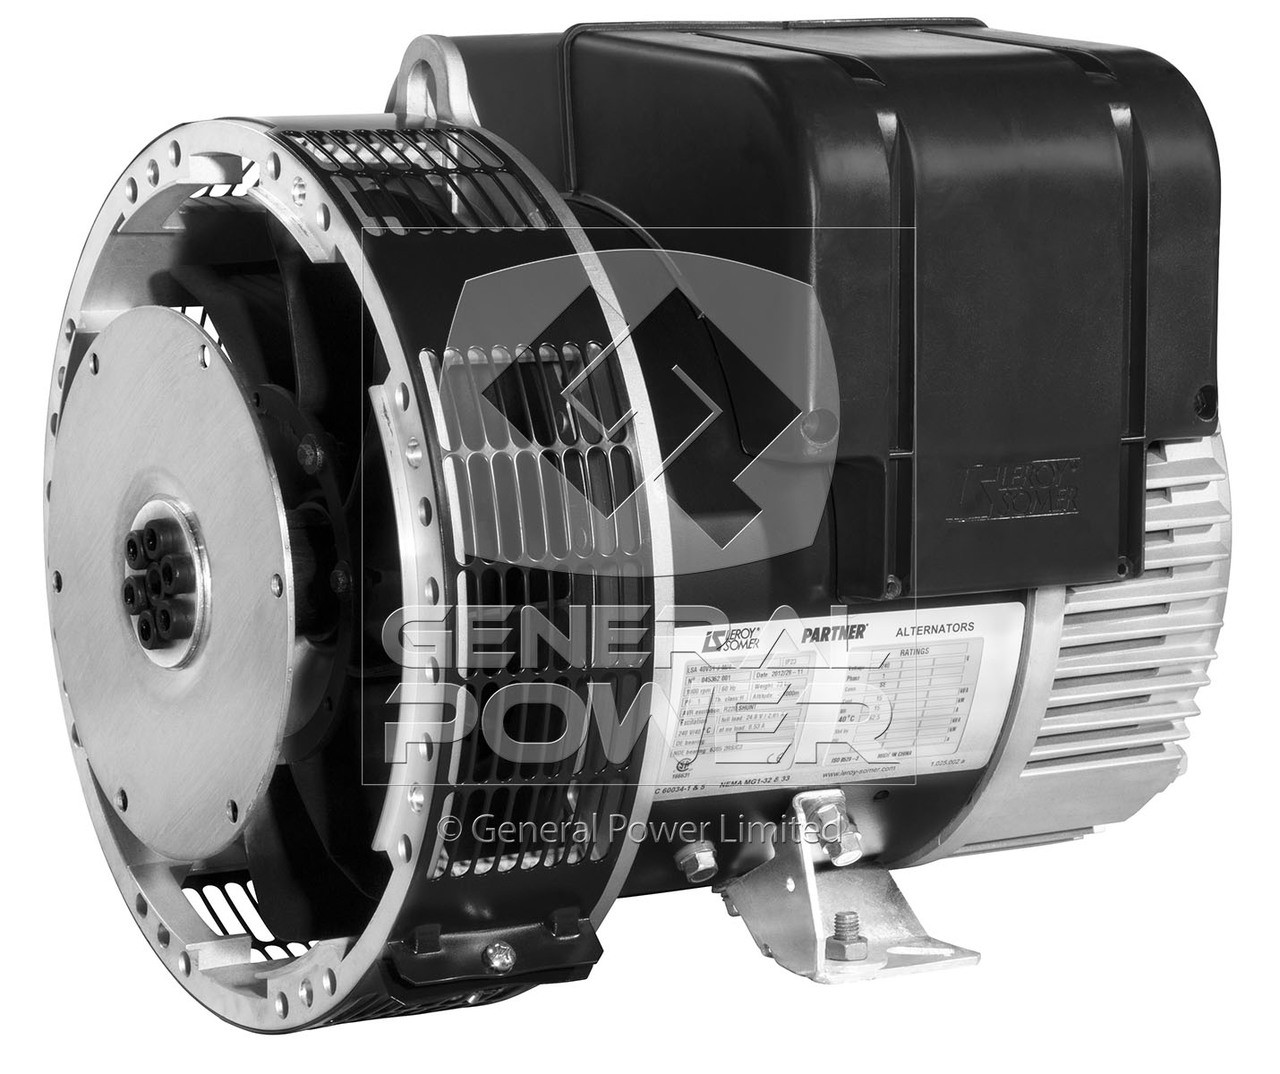 Leroy Somer LSA 423 M7 Alternator | Leroy Somer Generator